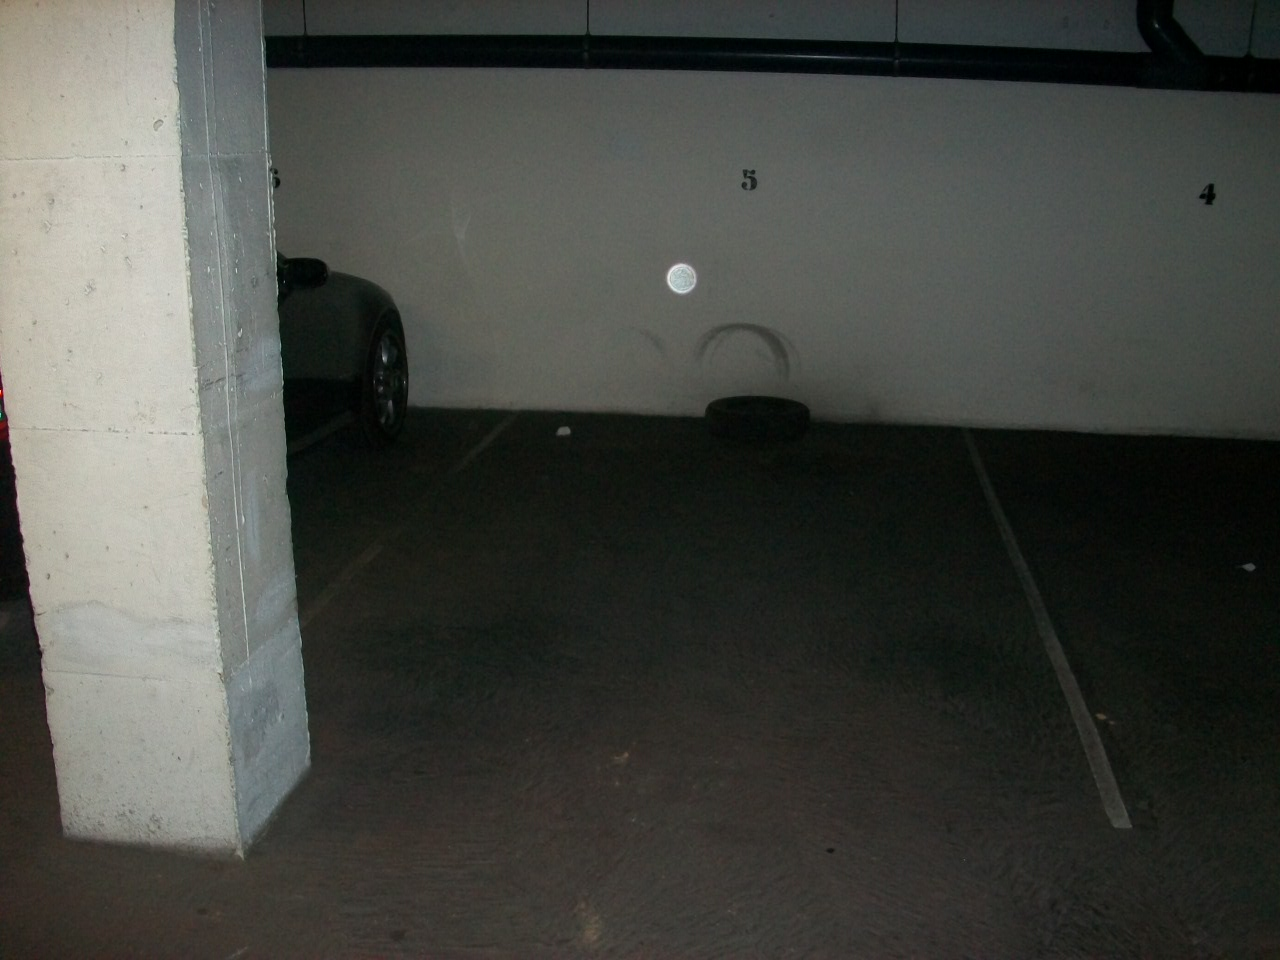 Alquiler Parking coche  Calle creu